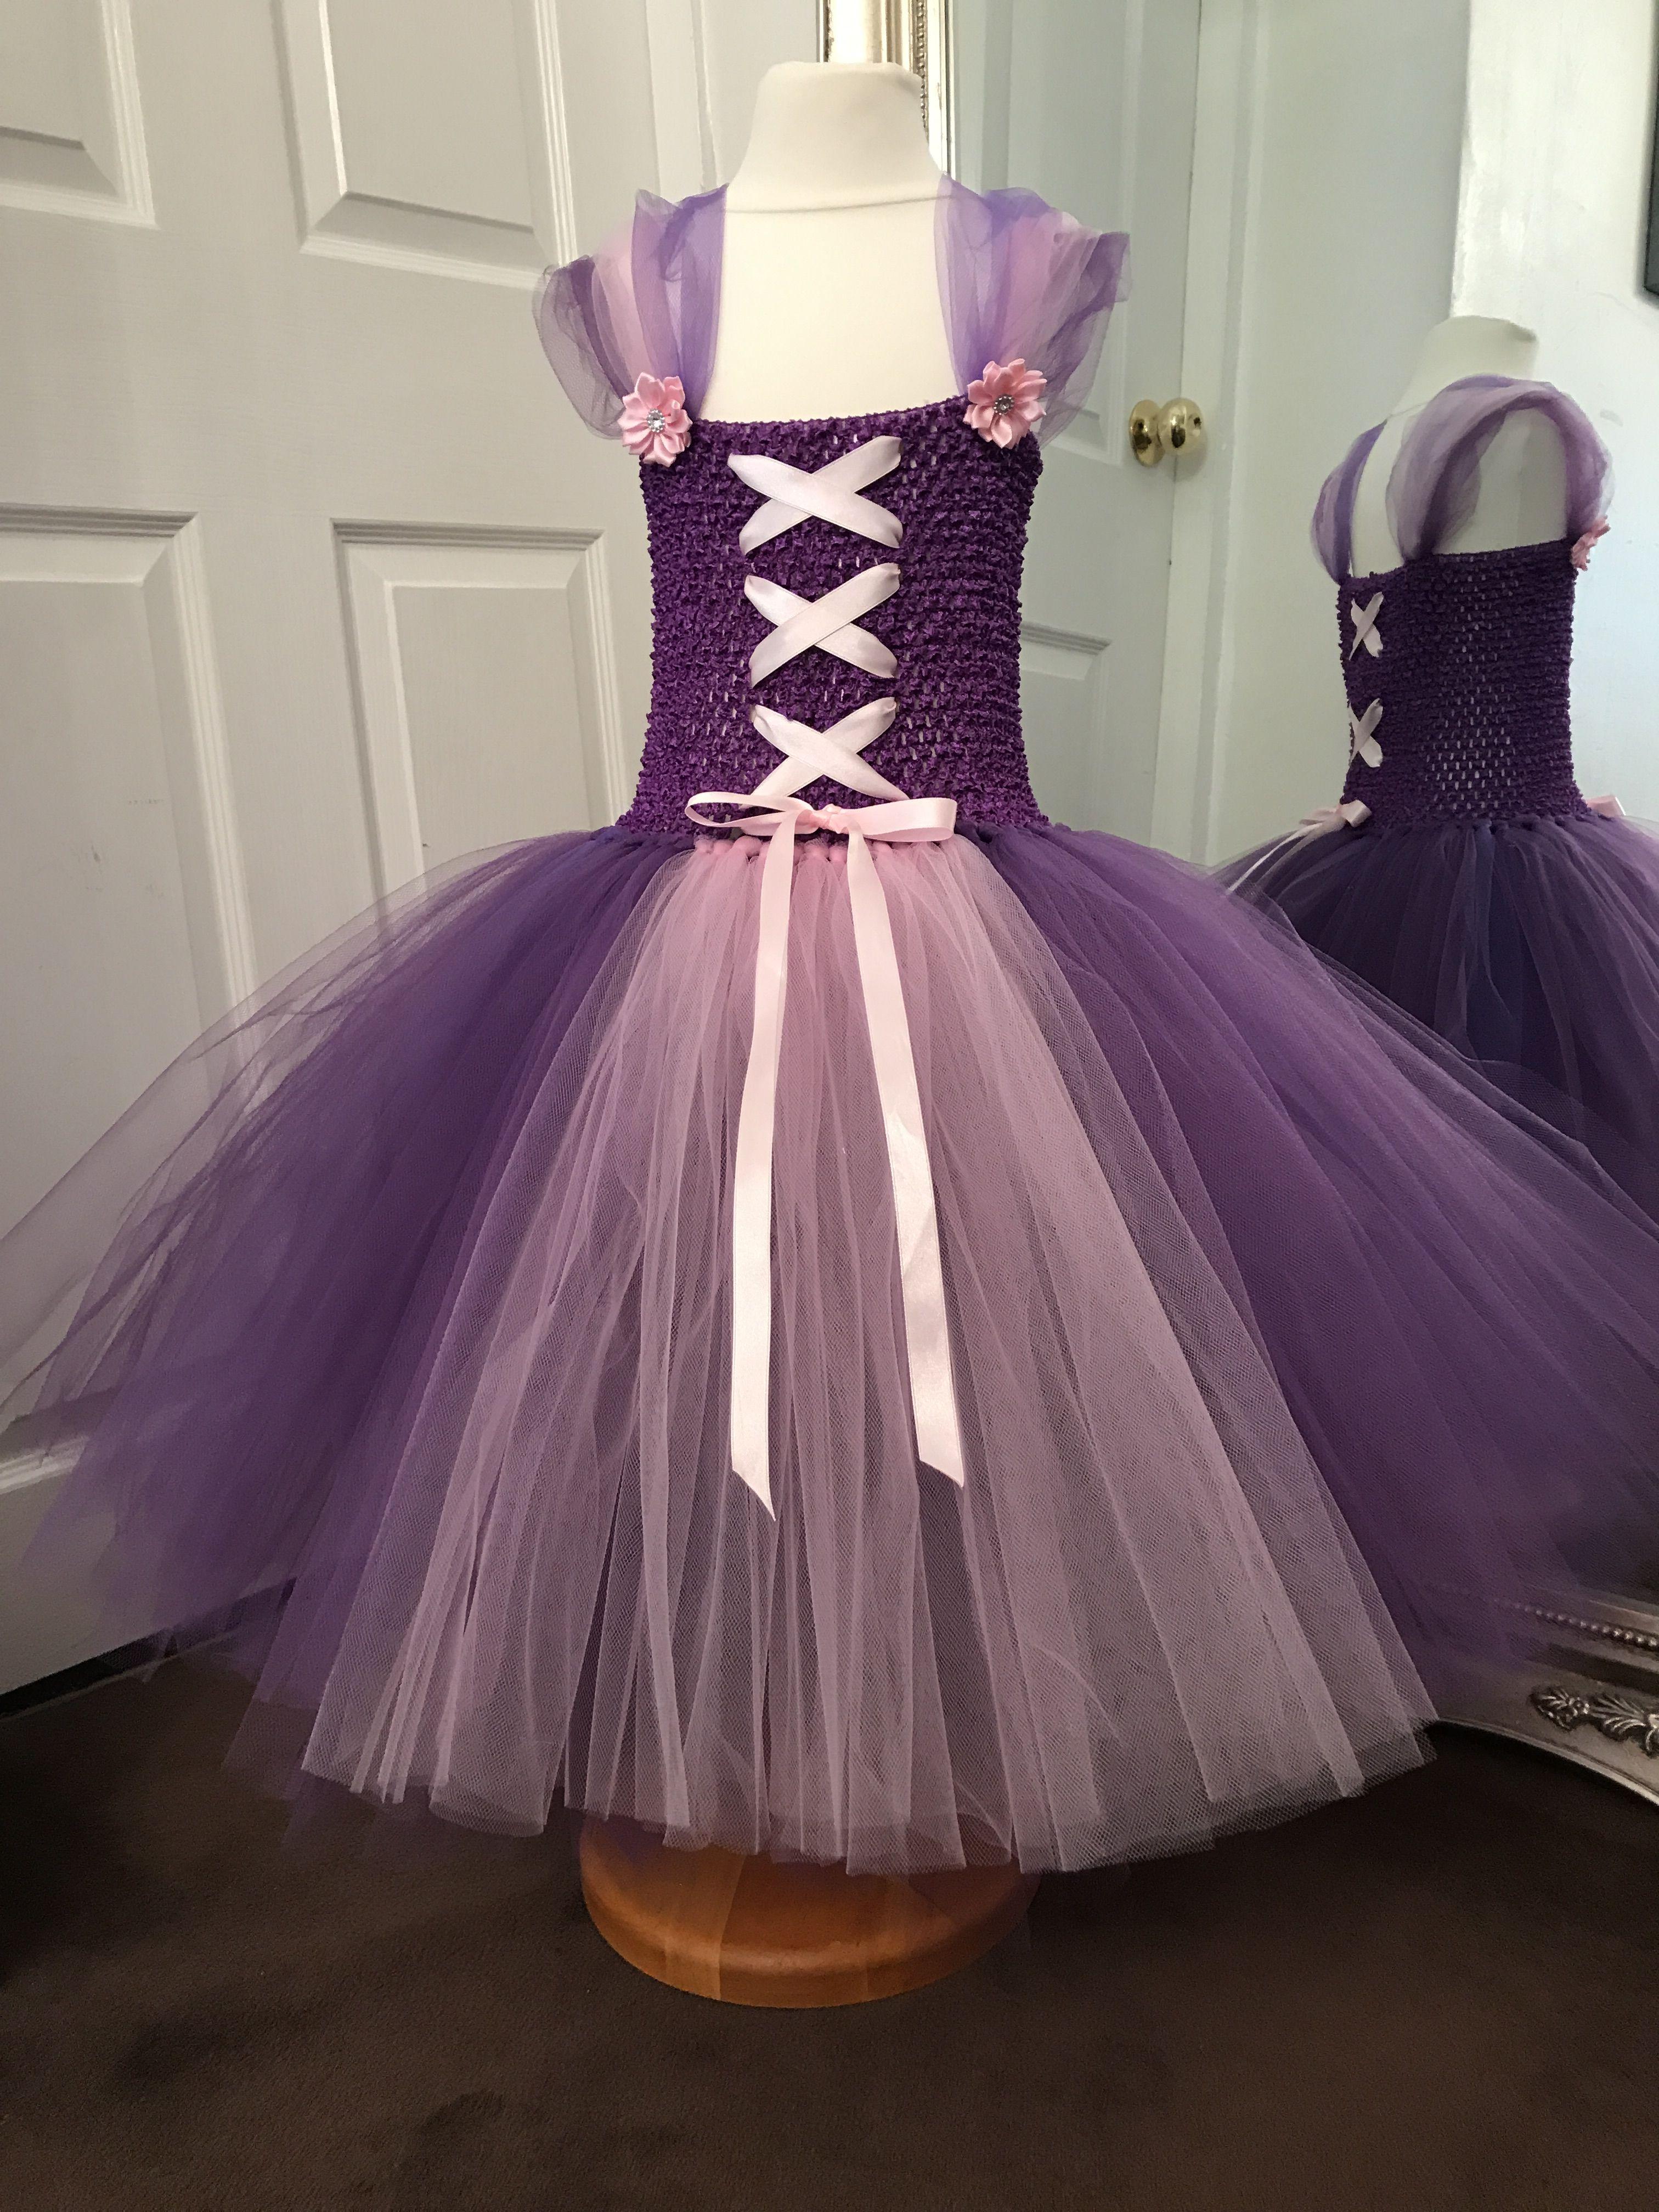 Rebunzel tulle dress crochet bodice age to order go to facebook